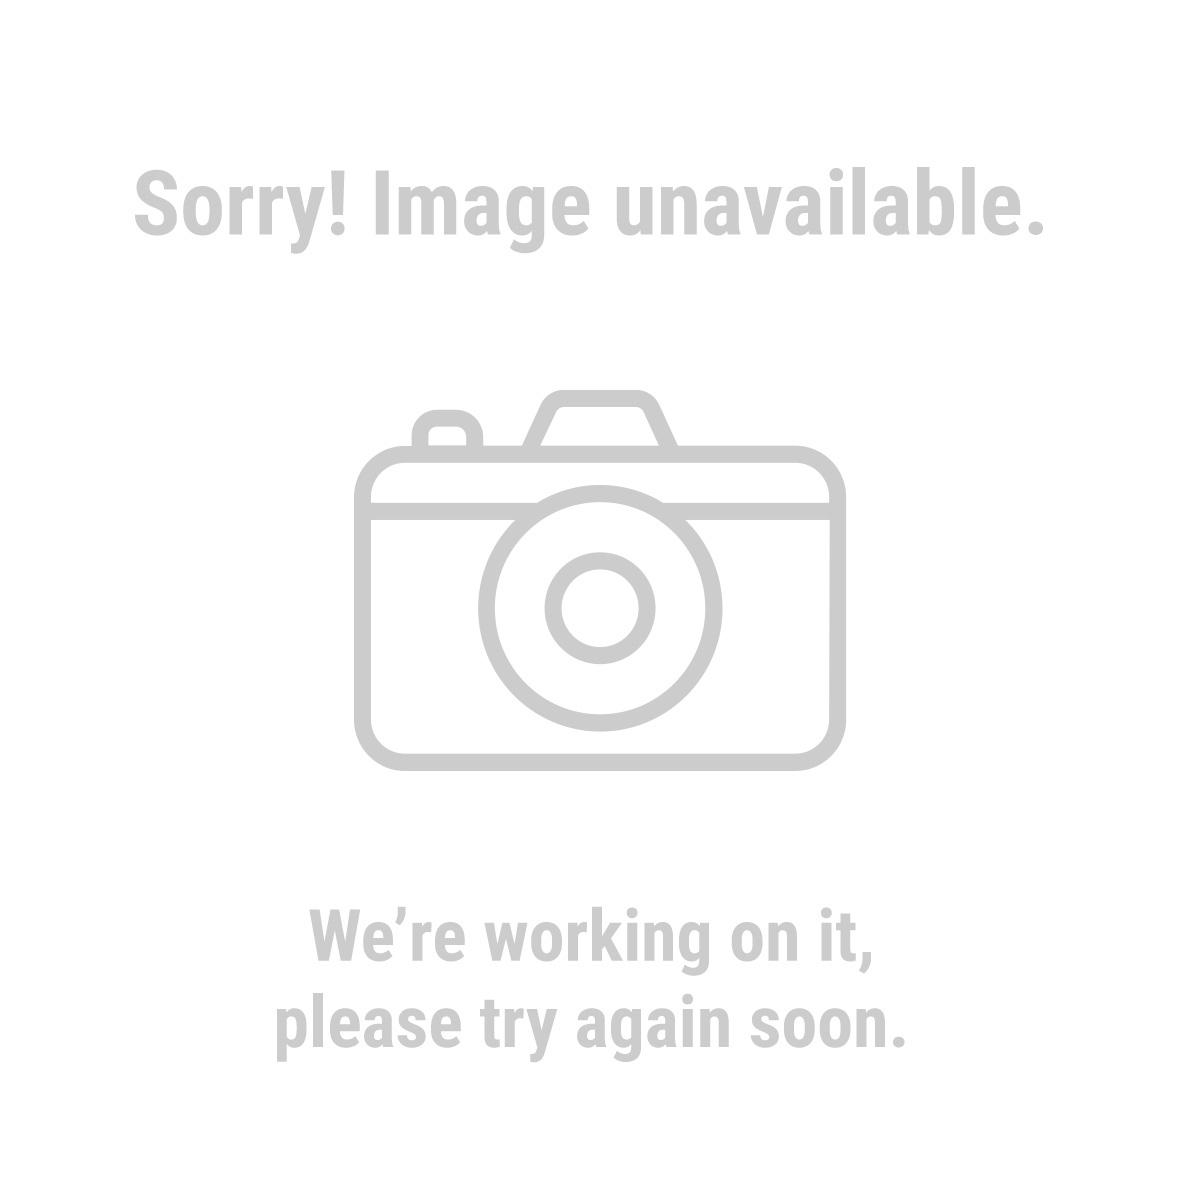 HFT® 60304 2-in-1 Microfiber Chenille Wash Mitt